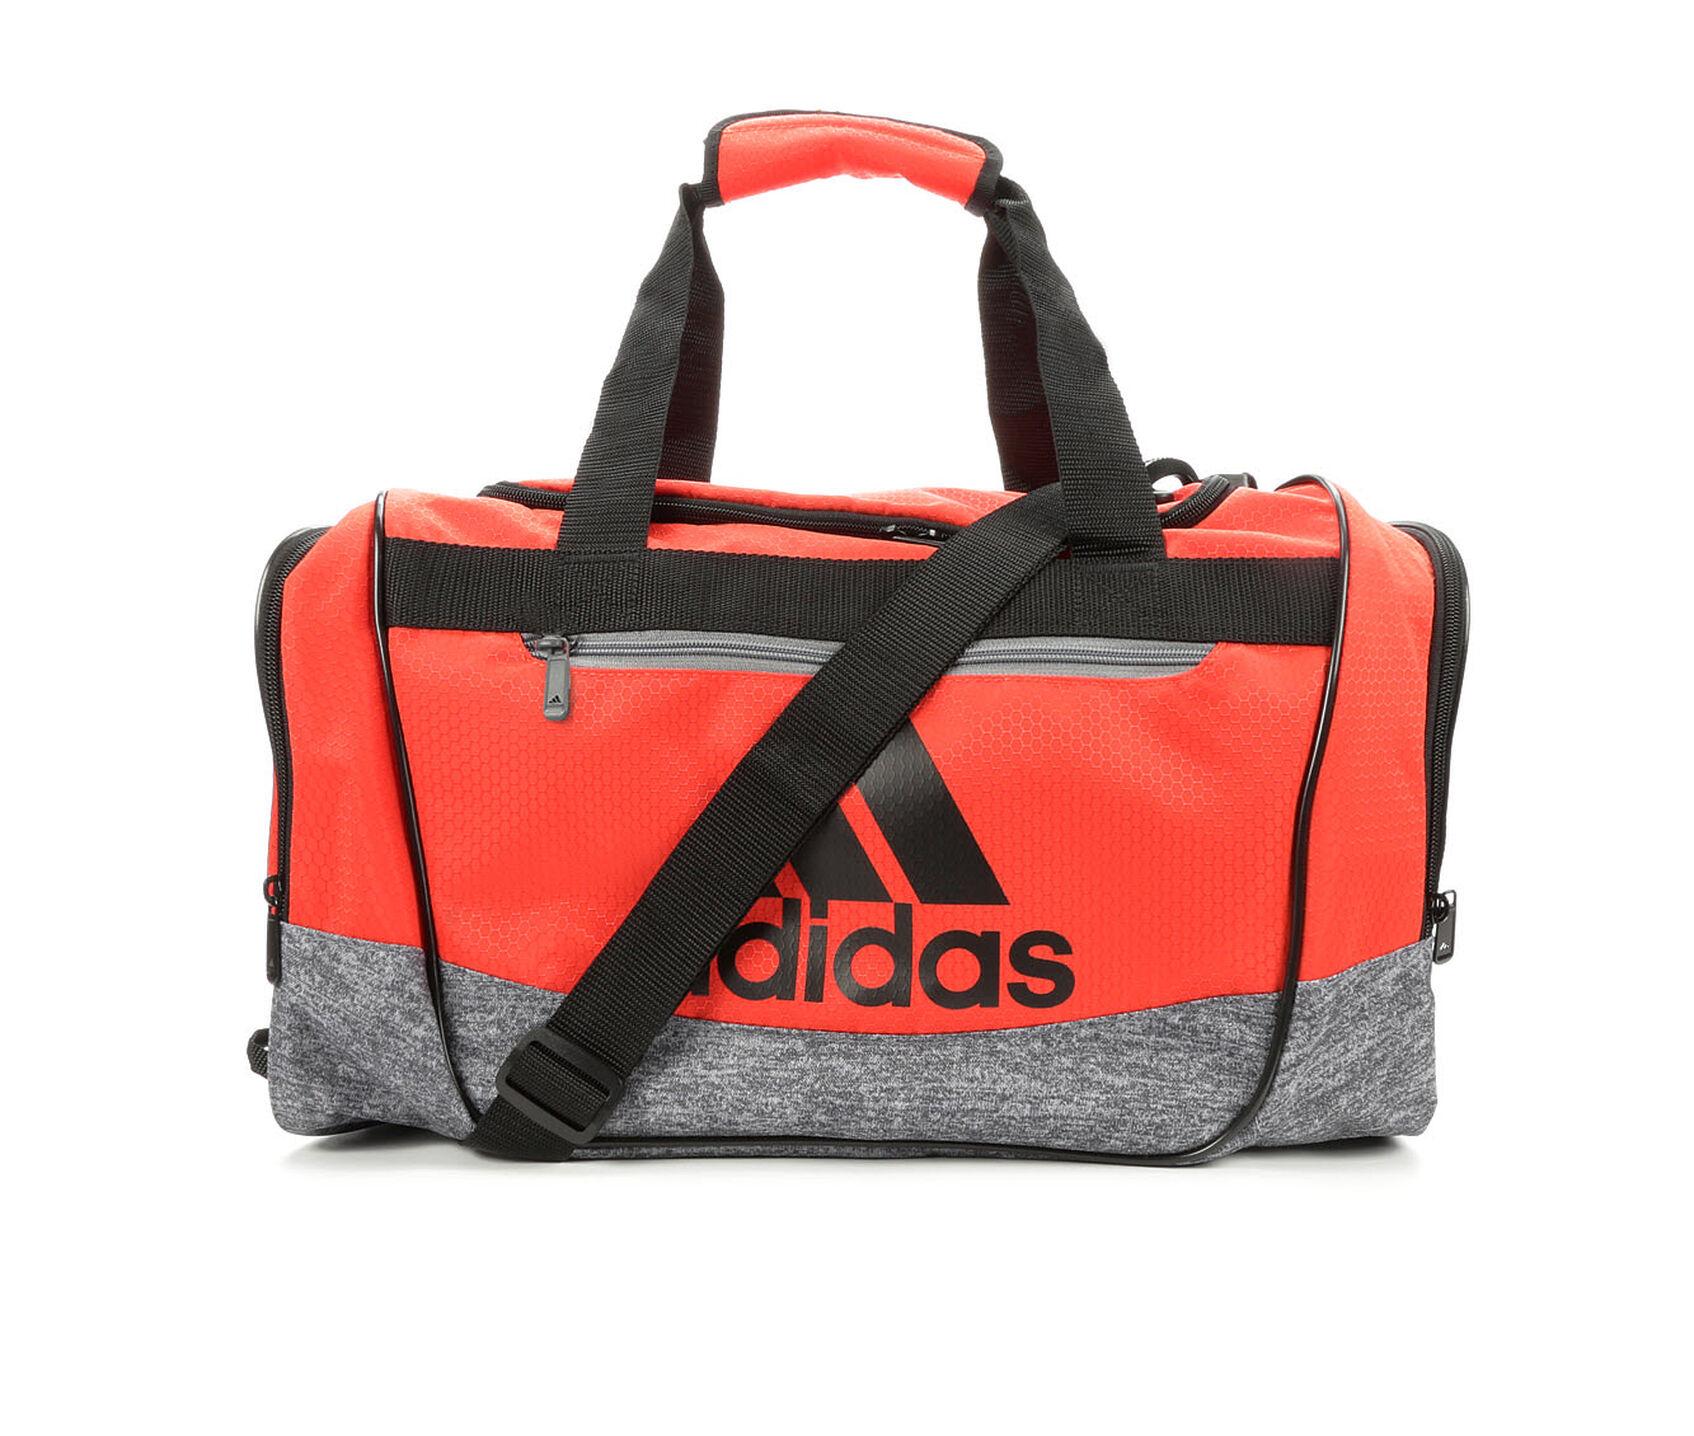 Adidas Defender Iii Small Duffel Bag Previous